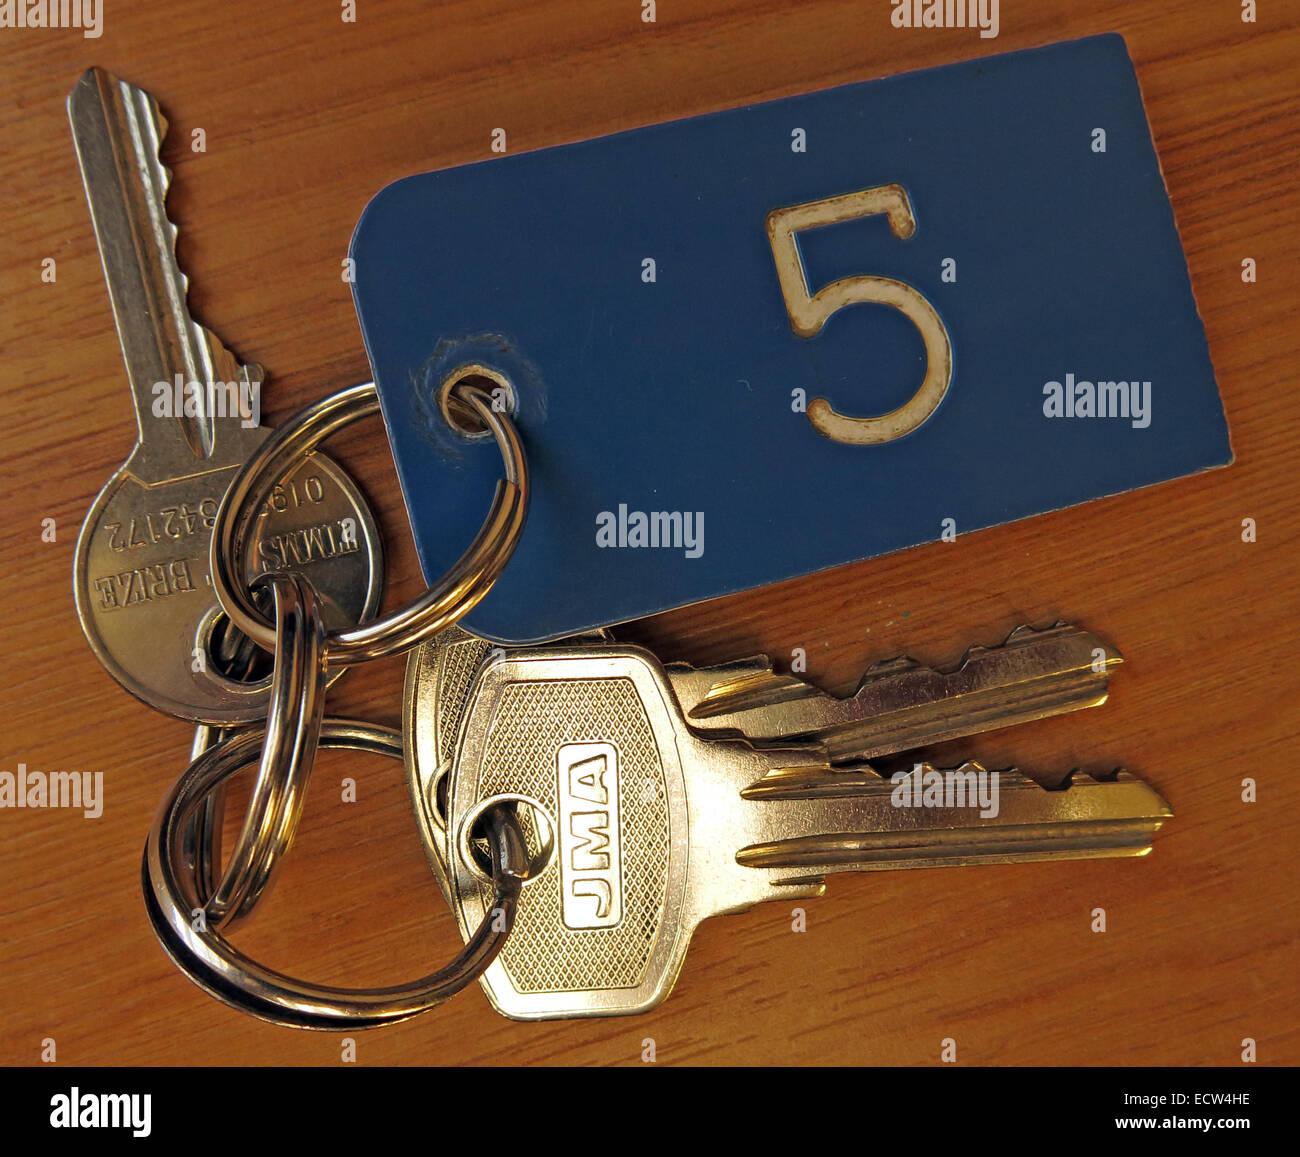 Five,key,keyring,on,a,table,three,metal,hotel,room,rooms,vacation,B&B,GoTonySmith